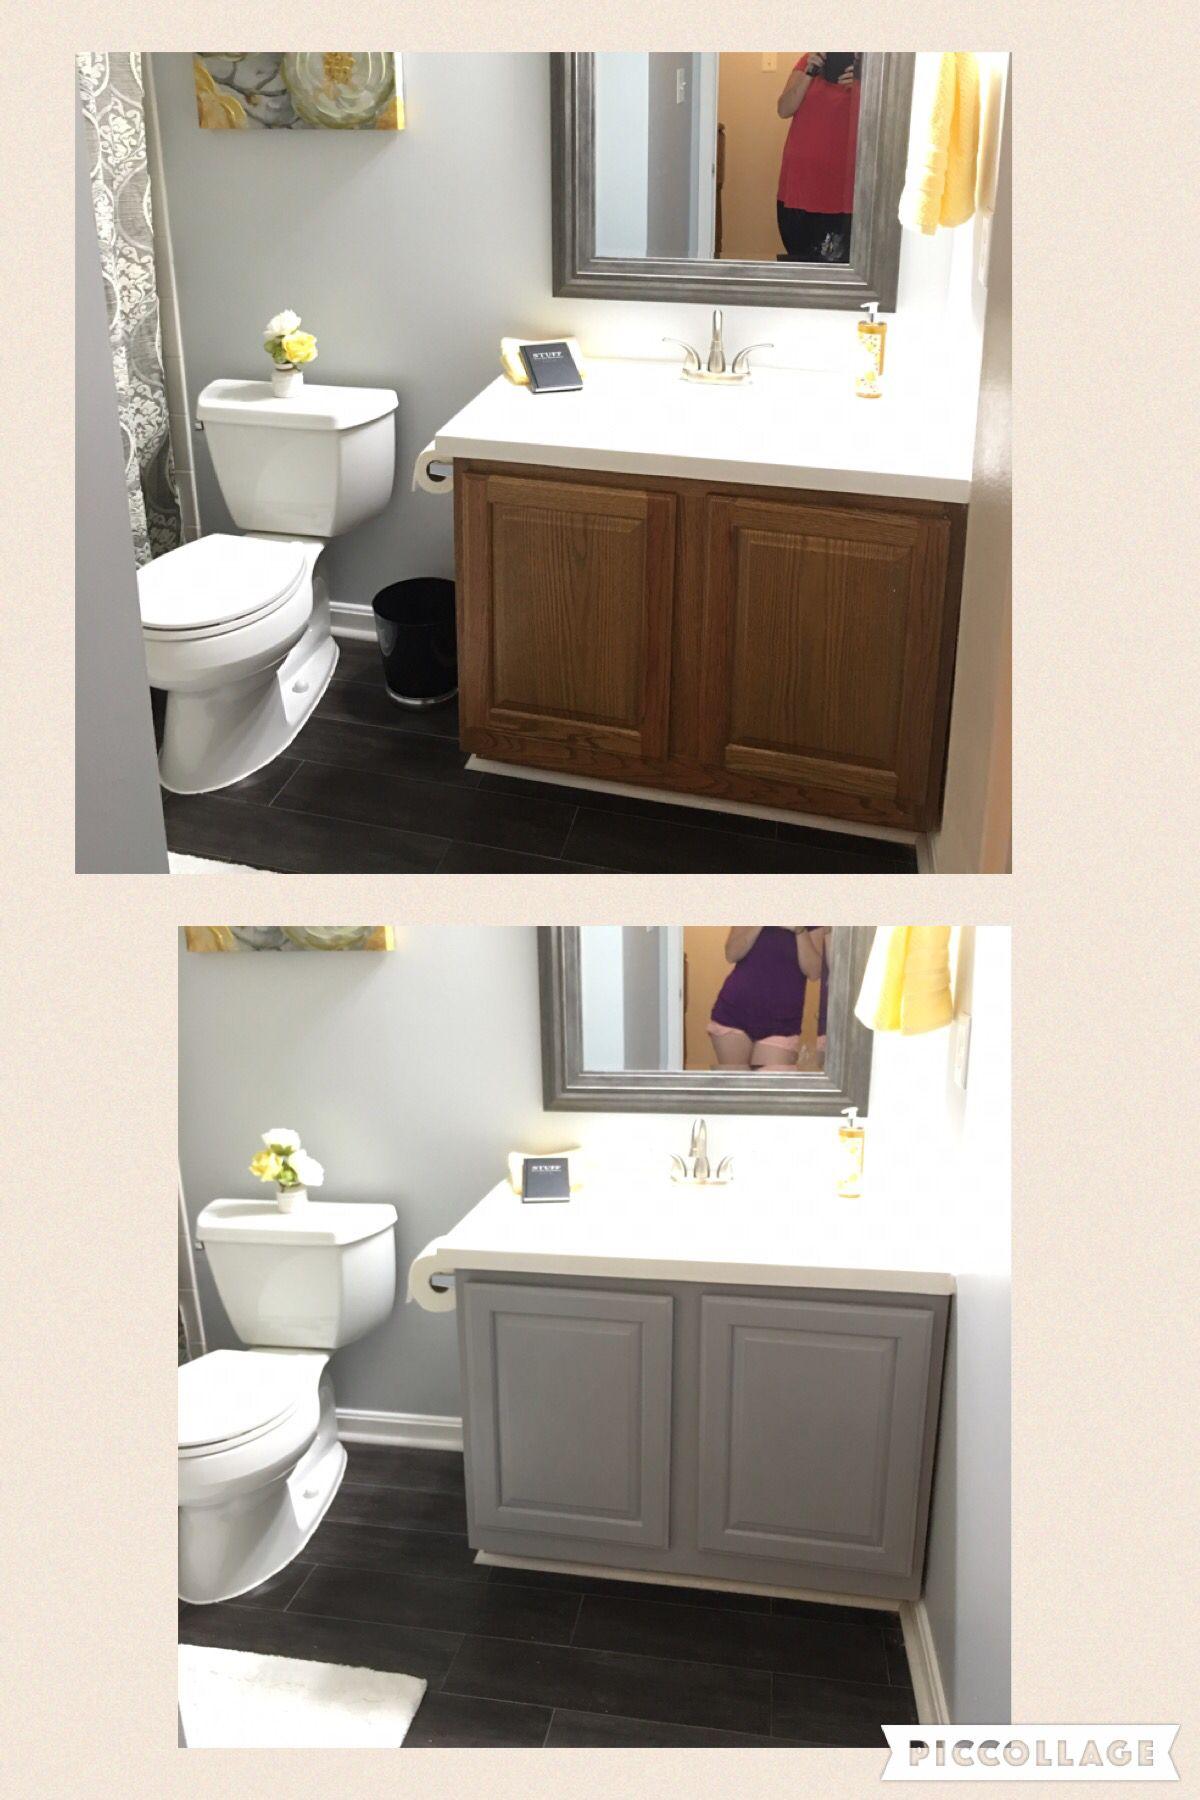 Before And After Bathroom Vanity With Annie Sloan Chalk Paint In Paris Grey Painted Vanity Bathroom Bathroom Vanity Redo Bathroom Vanity Bathroom vanity chalk paint